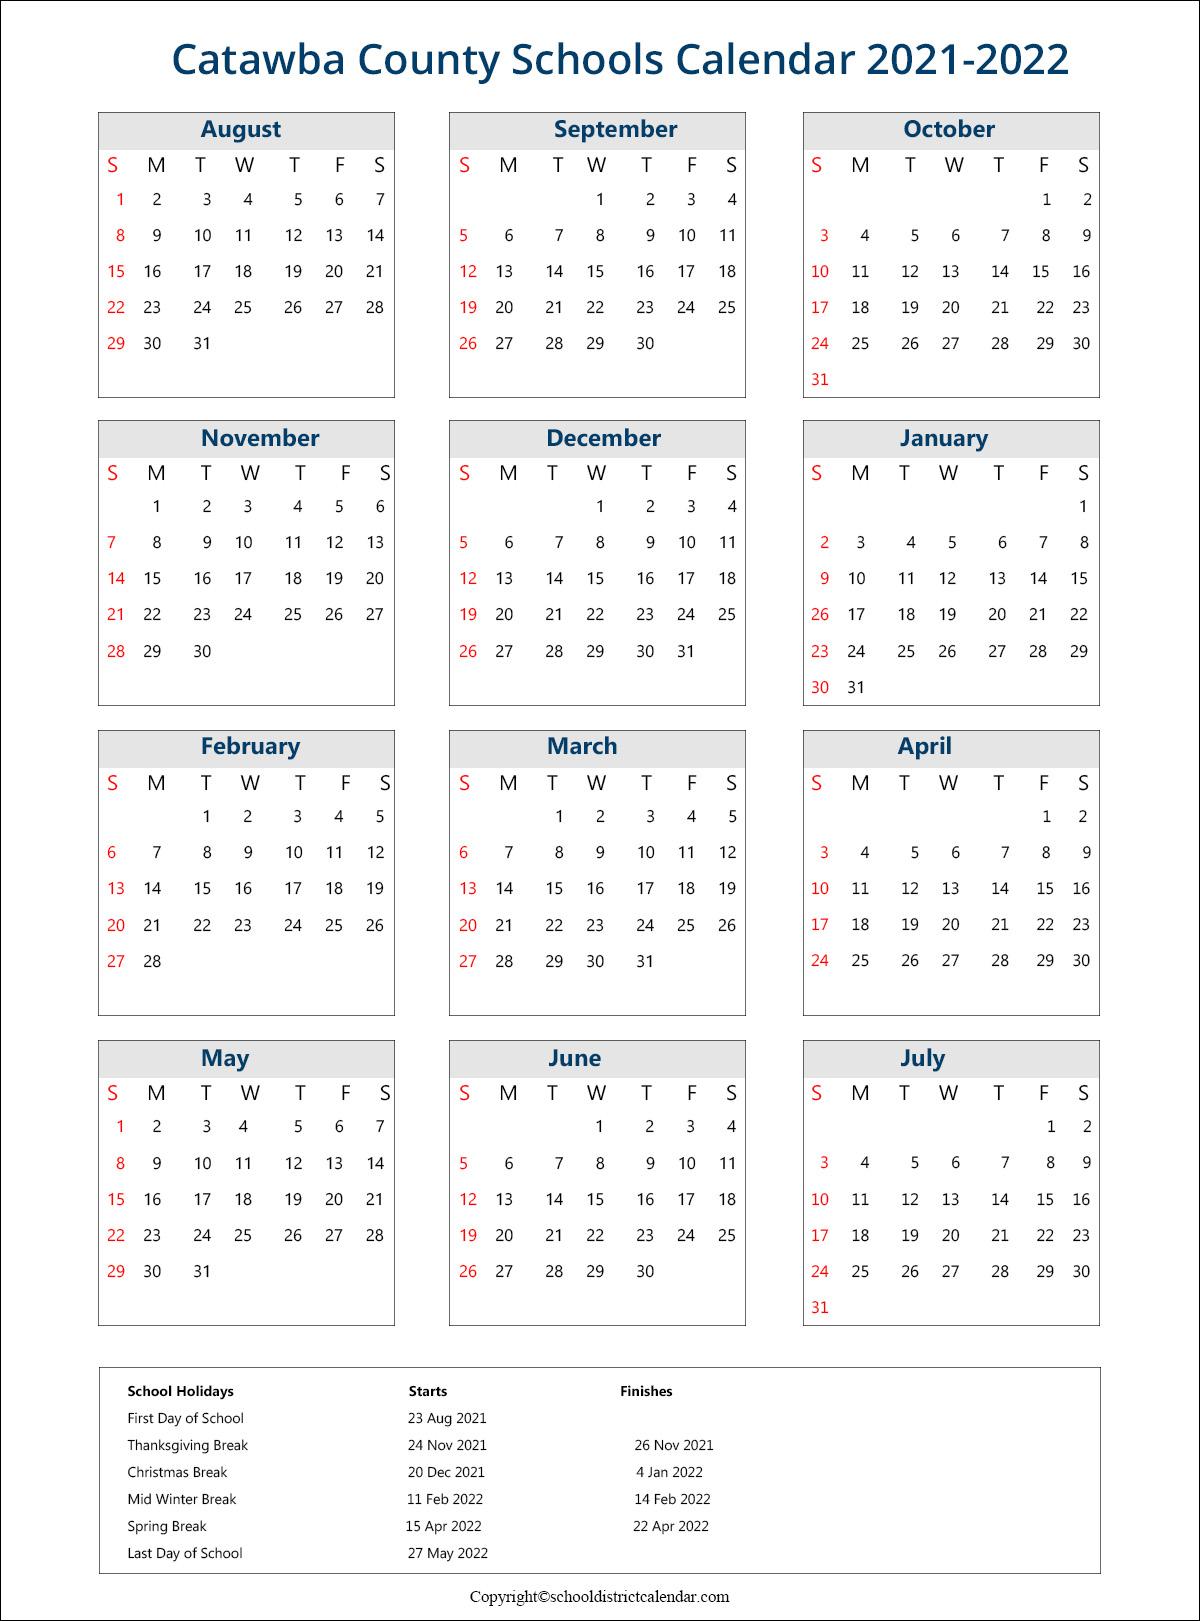 Catawba County Schools District, Newton Calendar Holidays 2021